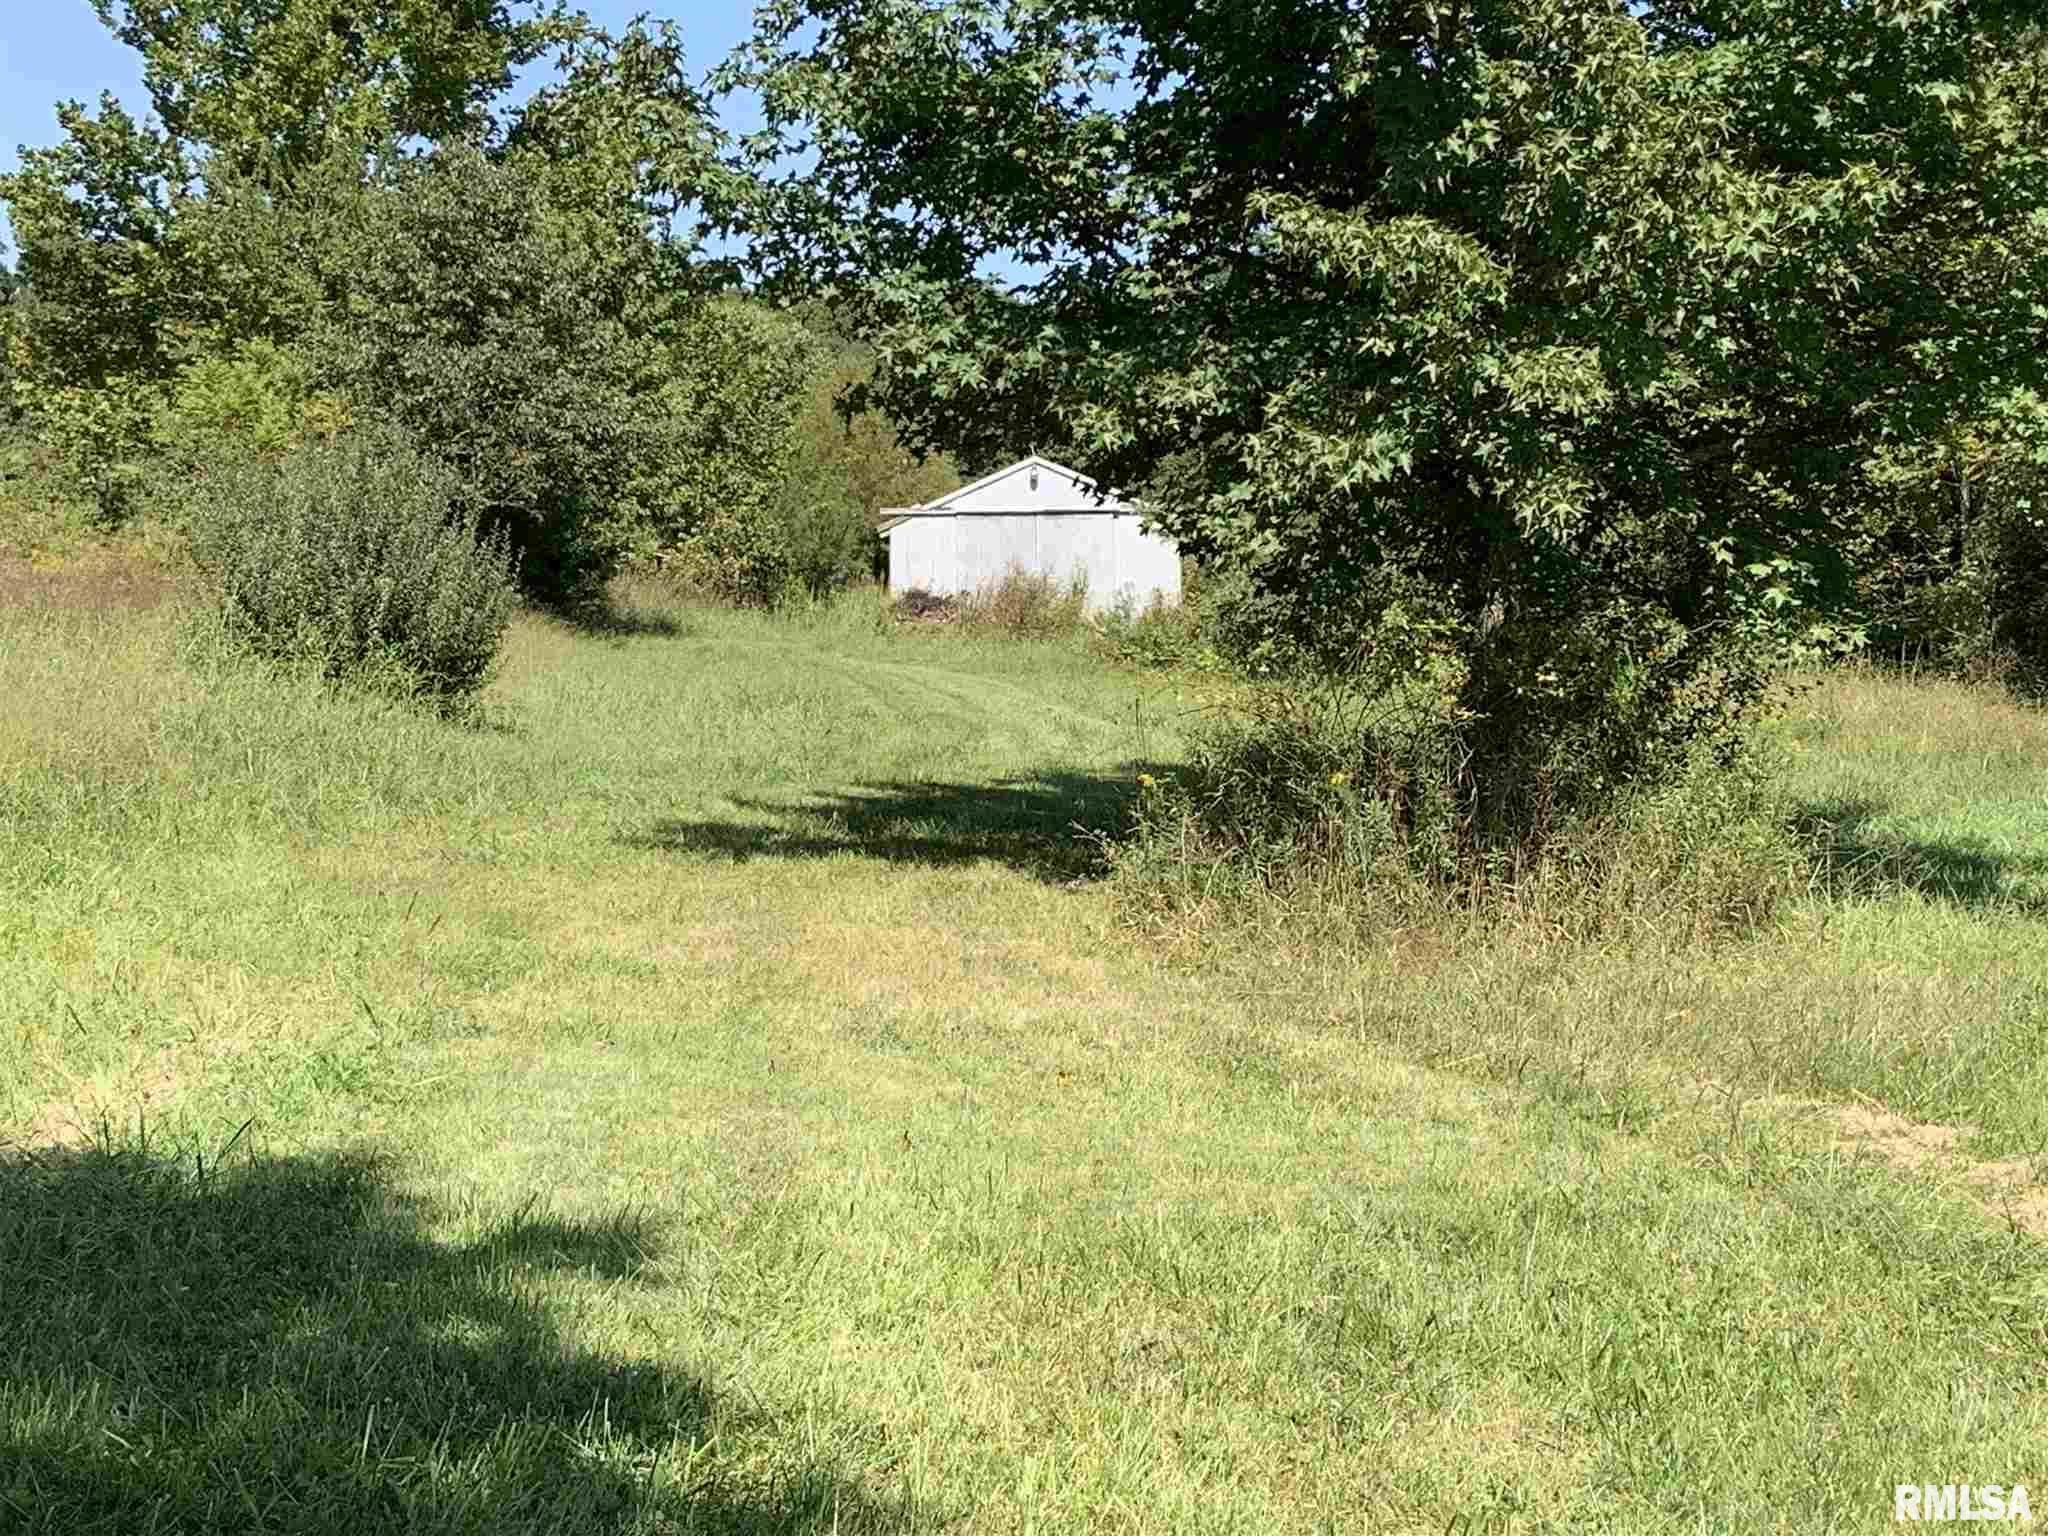 000 E McGuire Property Photo - Makanda, IL real estate listing